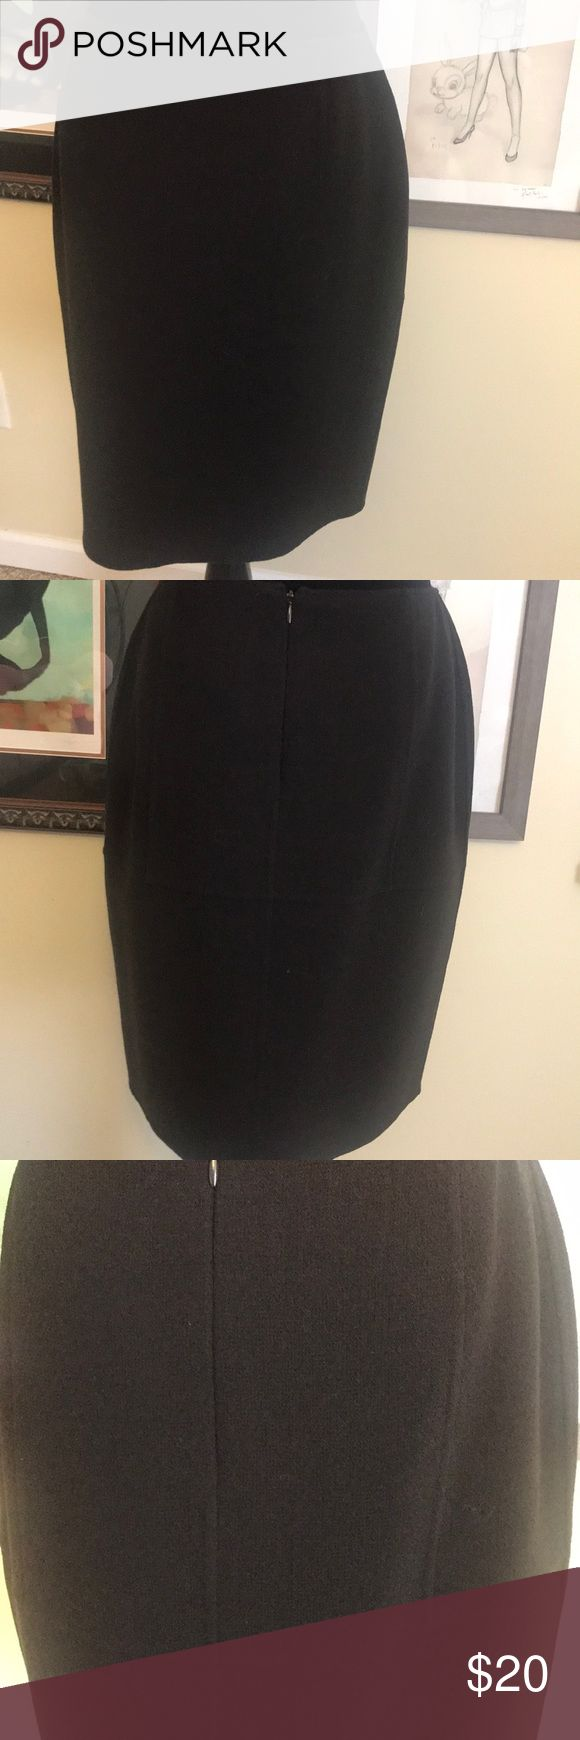 Anne Klein Petite Pencil Skirt Dark chocolate brown wool skirt with beautiful pattern built in. Size 8 Petite. Anne Klein Skirts Pencil